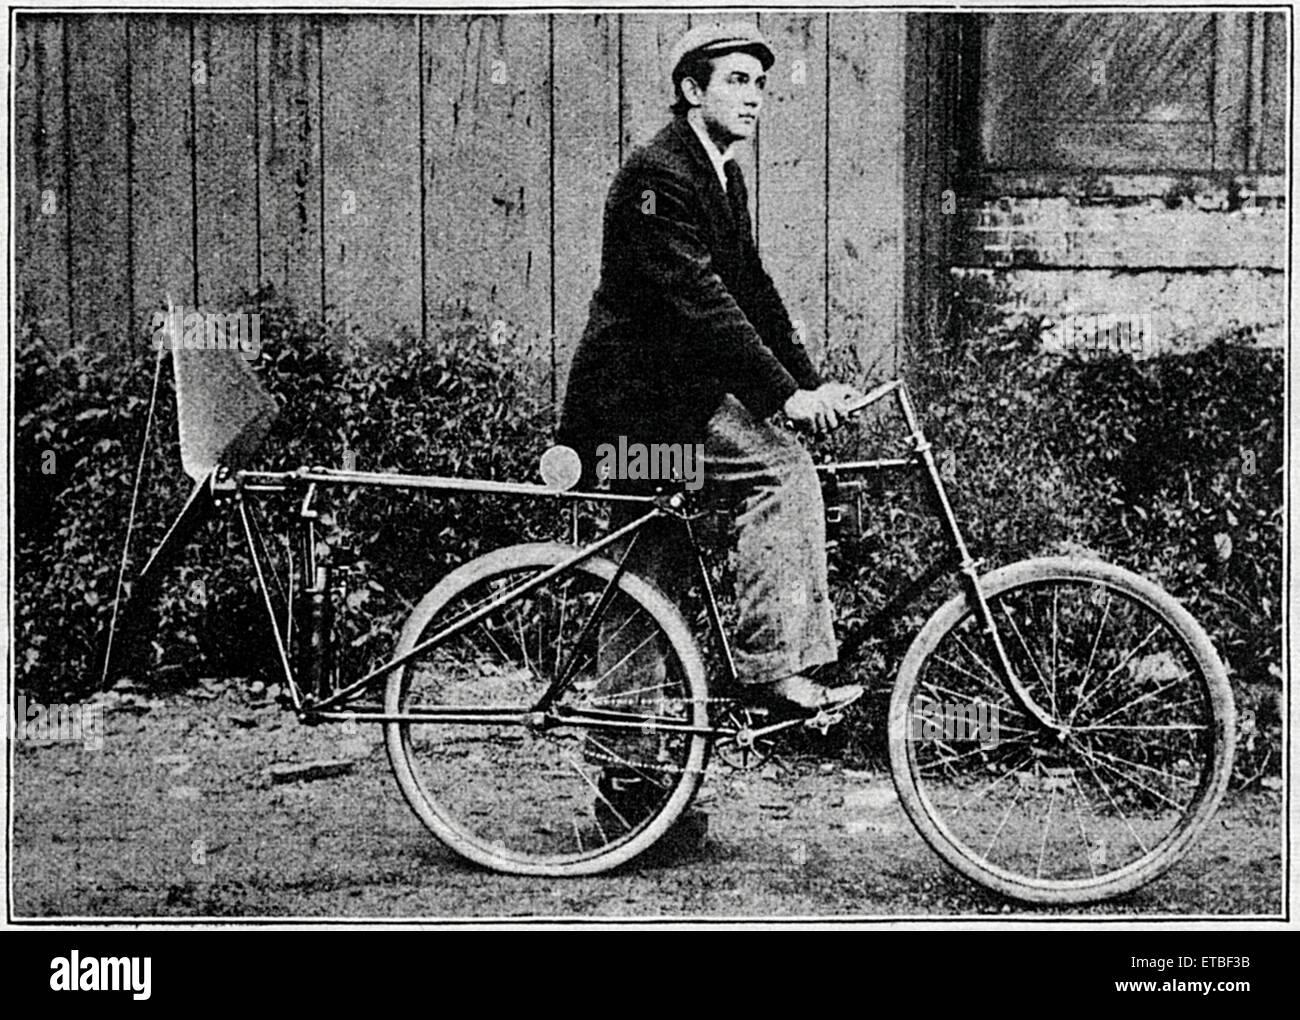 Mann am Ventilator-Motor-Fahrrad, Racine, Wisconsin, USA, ca. 1896 Stockbild